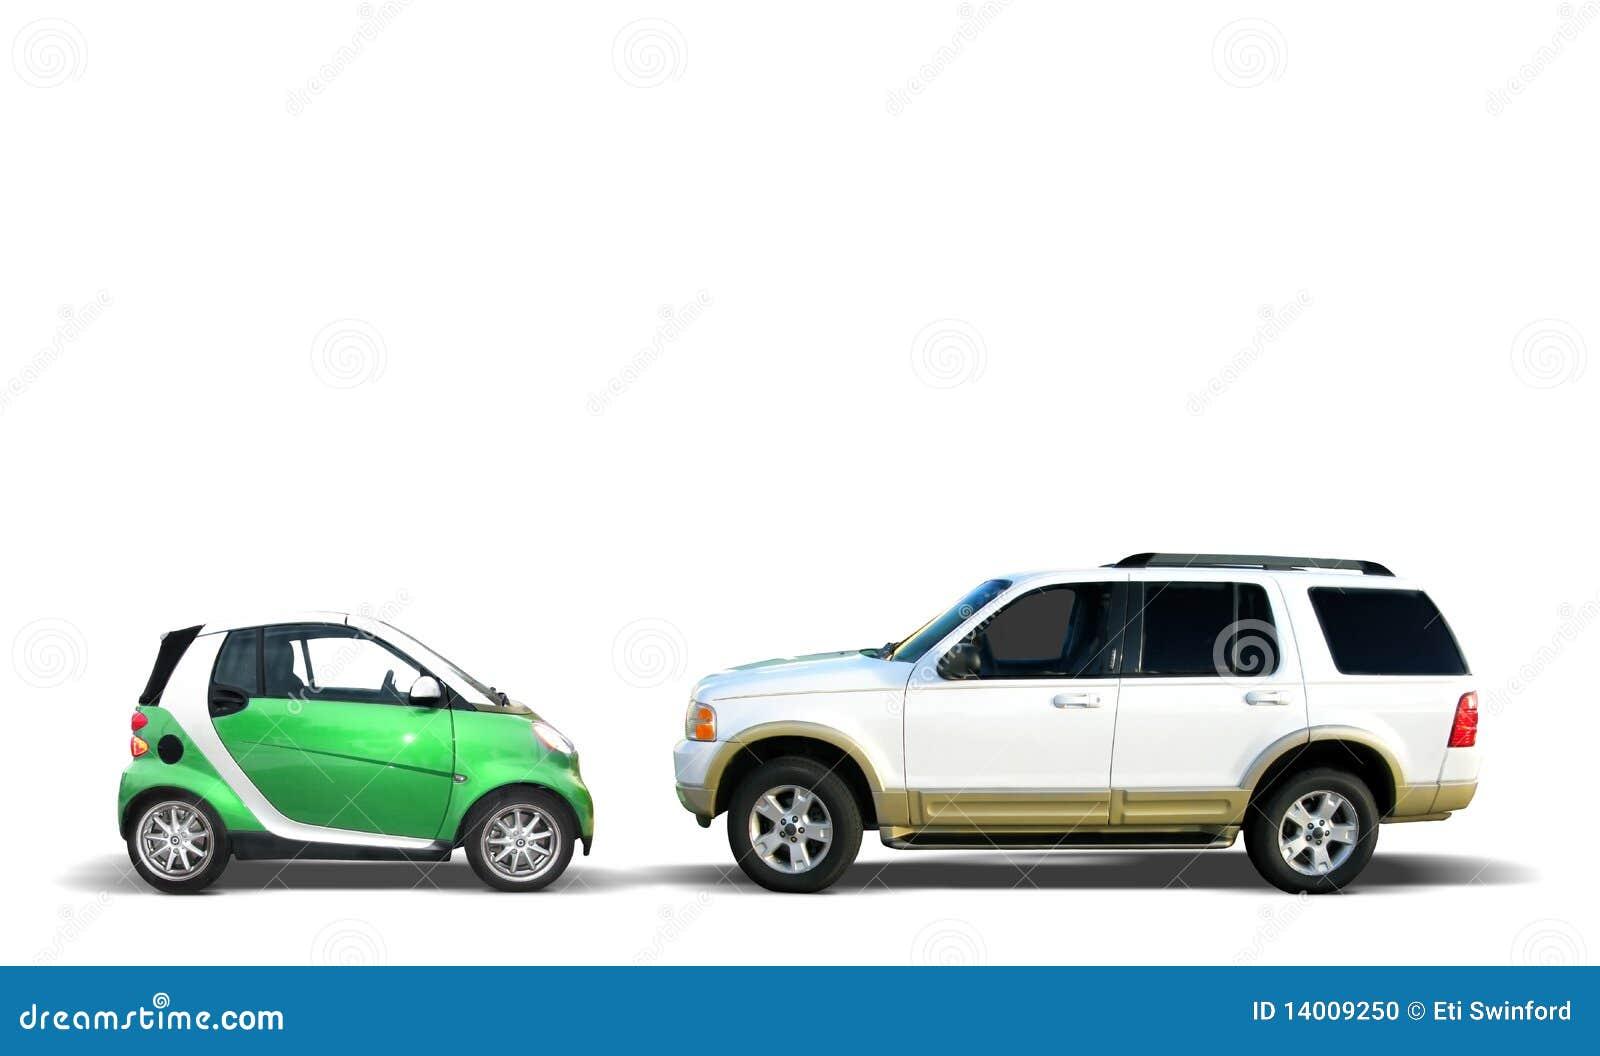 cars comparison stock photo image 14009250. Black Bedroom Furniture Sets. Home Design Ideas